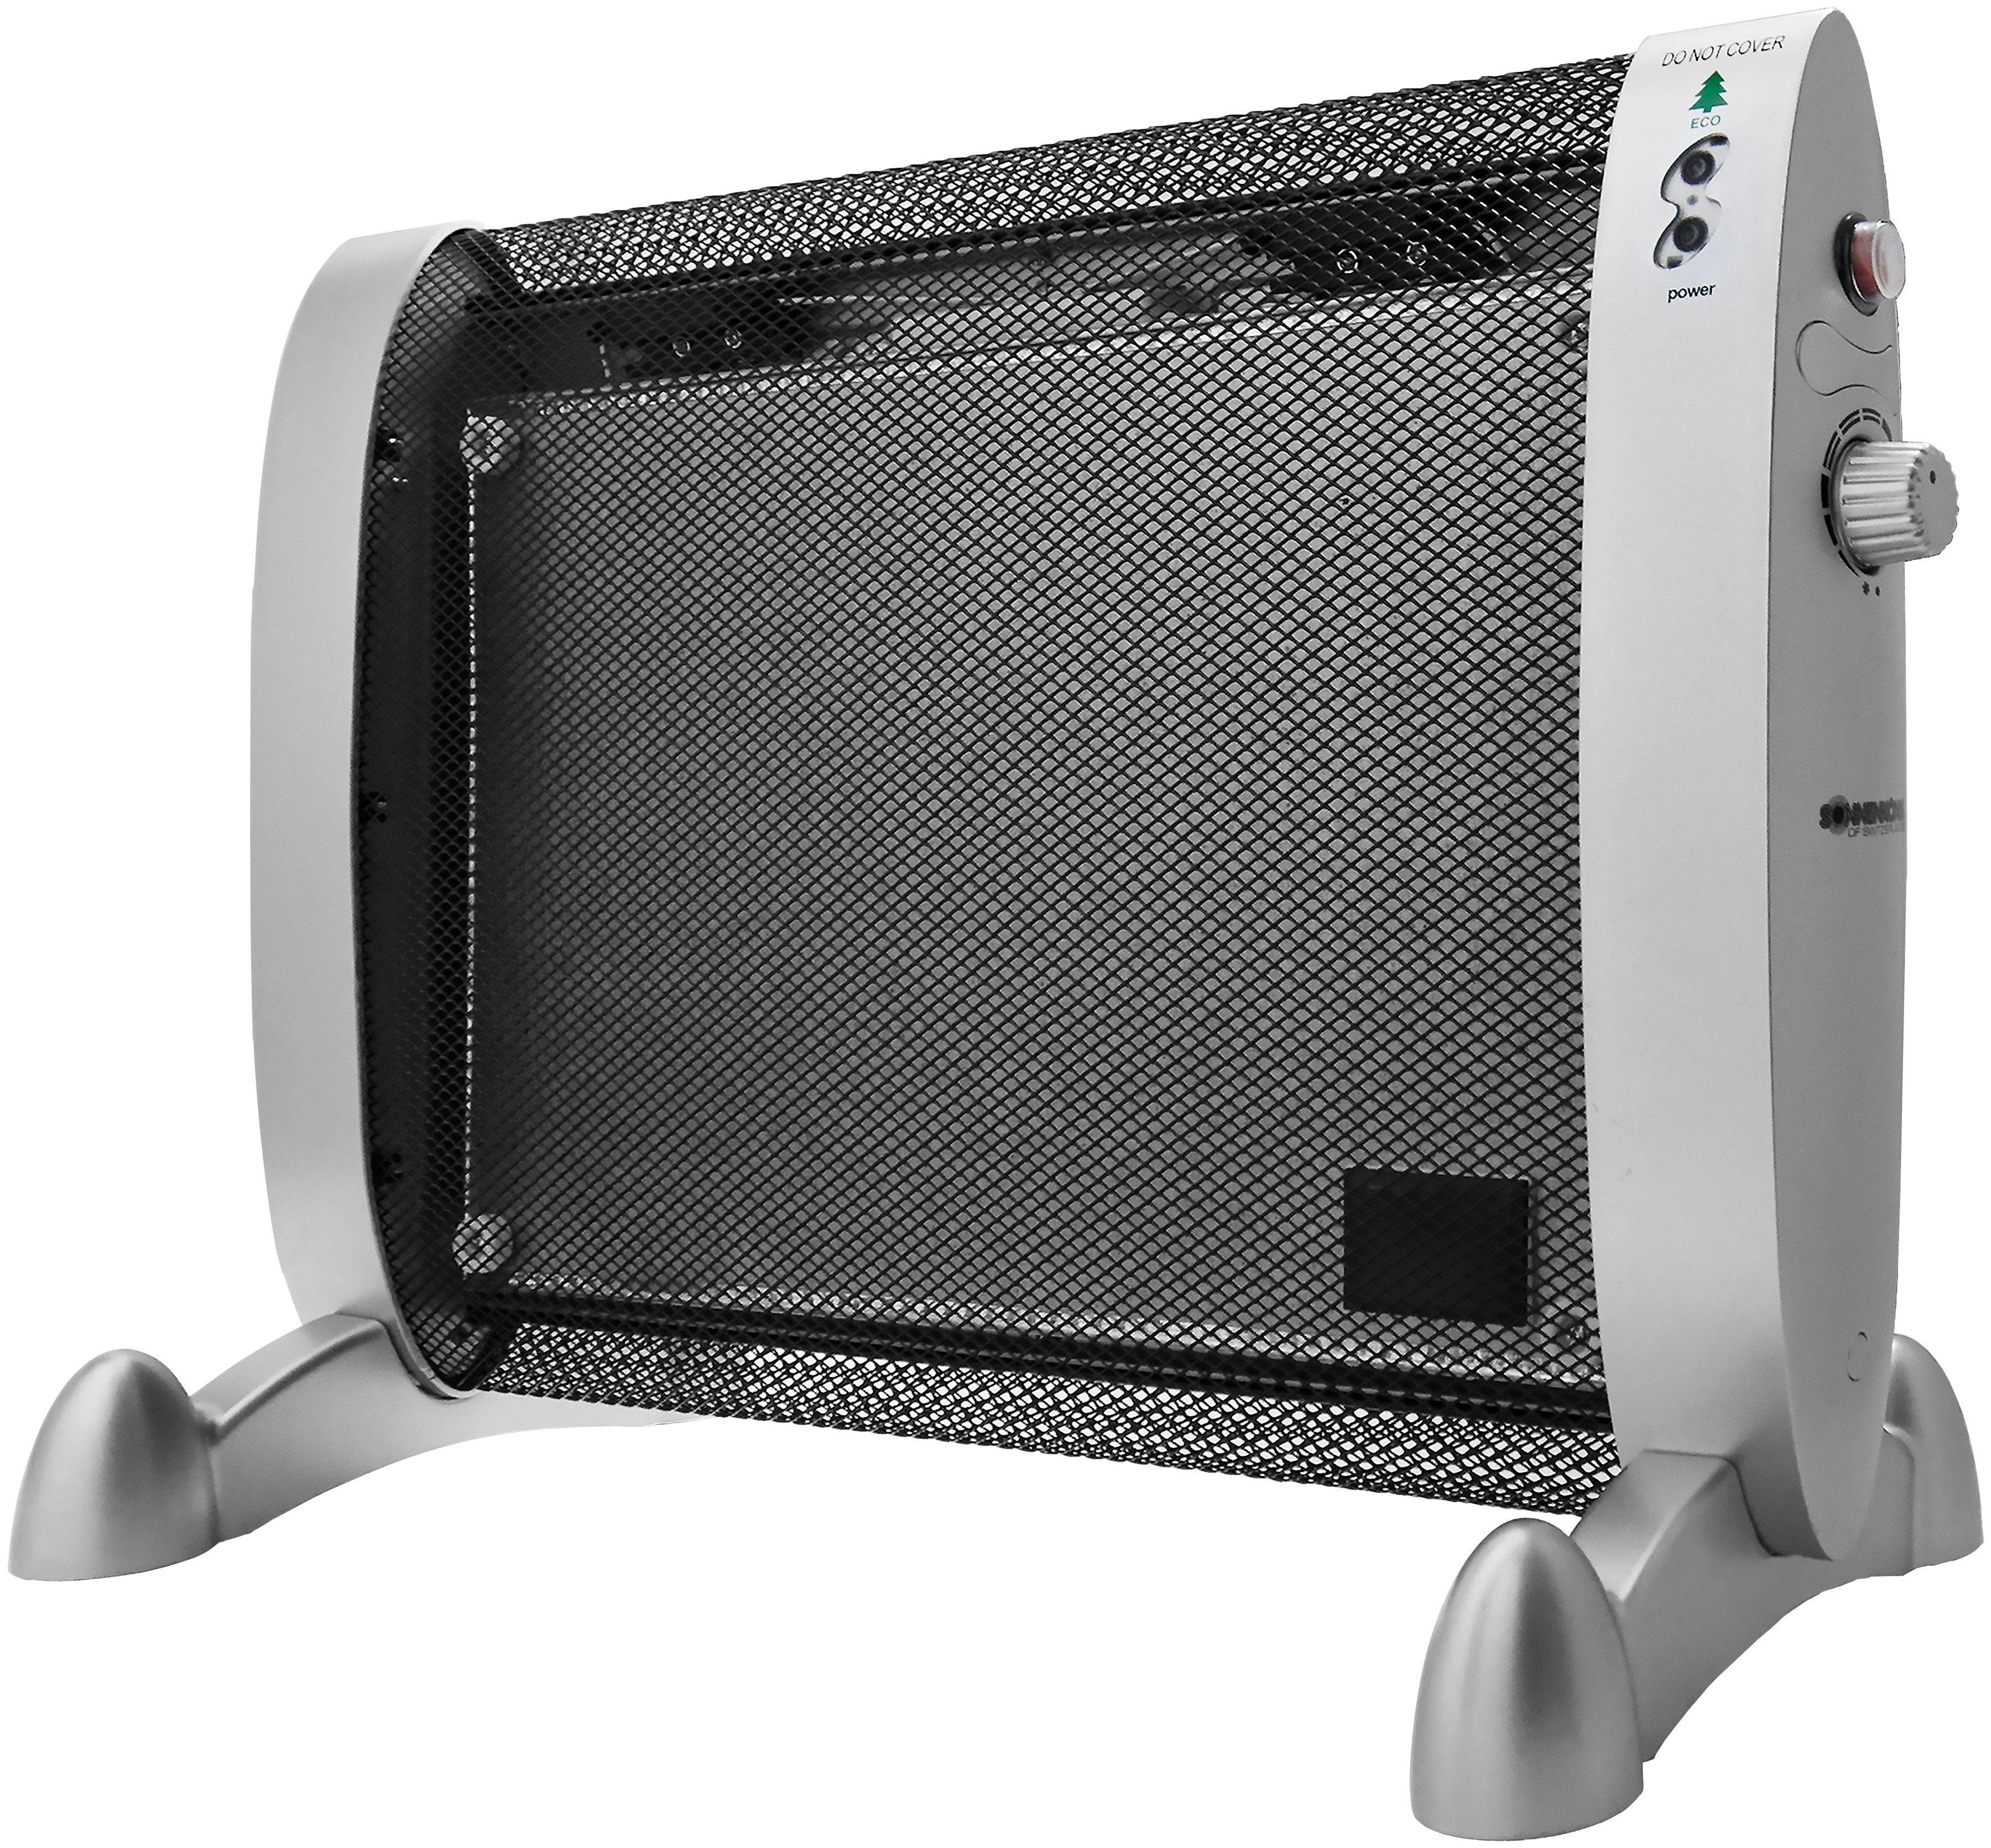 SONNENKÖNIG Wärmewelle »Maximo 1000«, silberfarben, 1000 Watt, Eco-Funktion